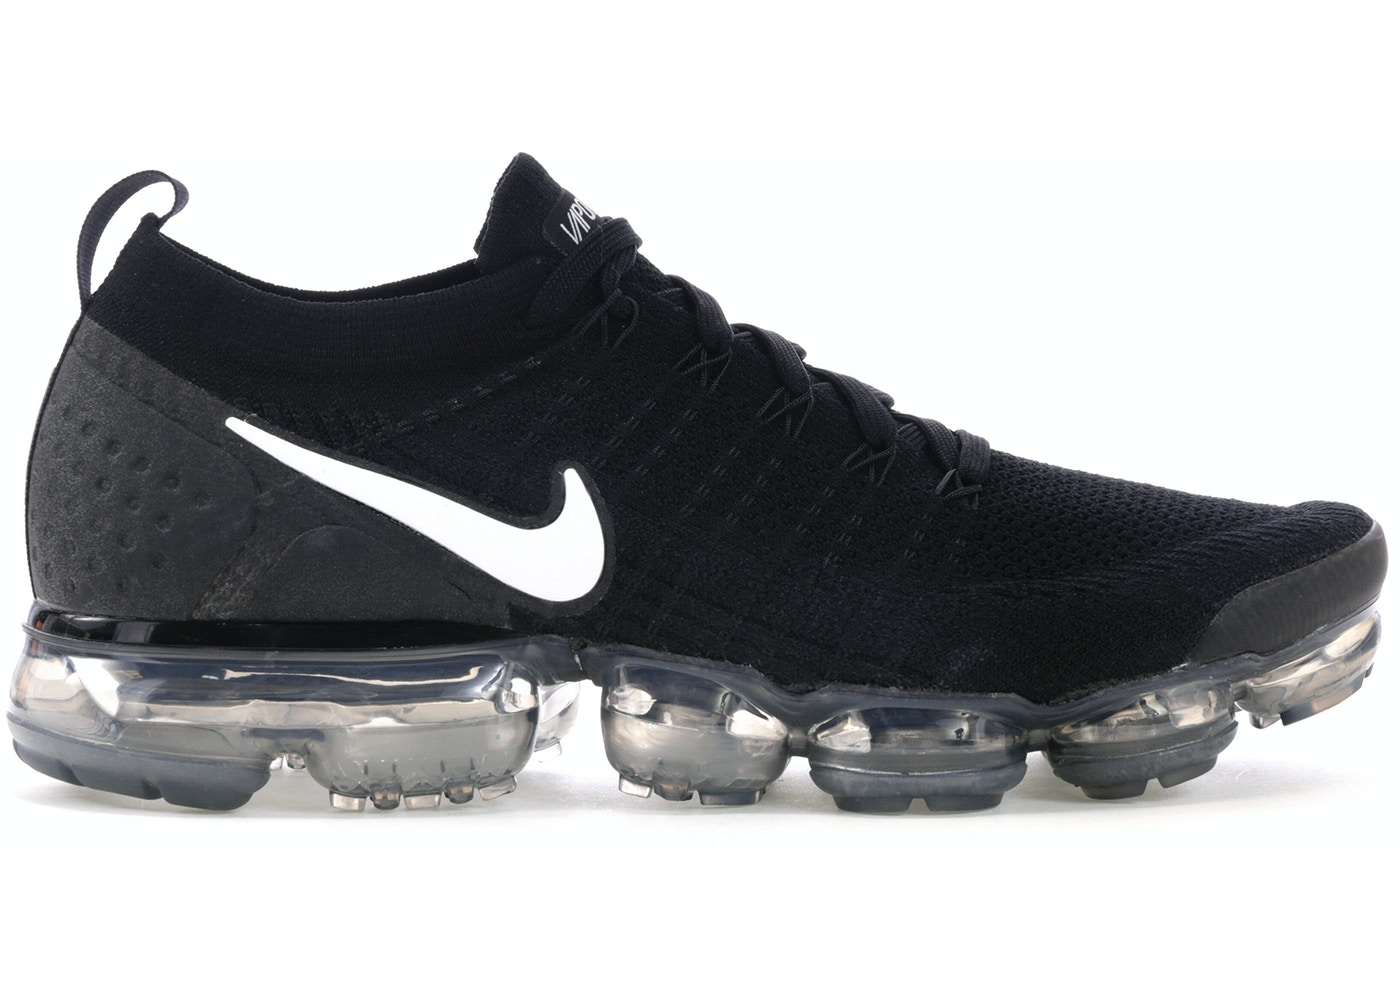 Buy Nike Air Max VaporMax Shoes   Deadstock Sneakers b829233dc0